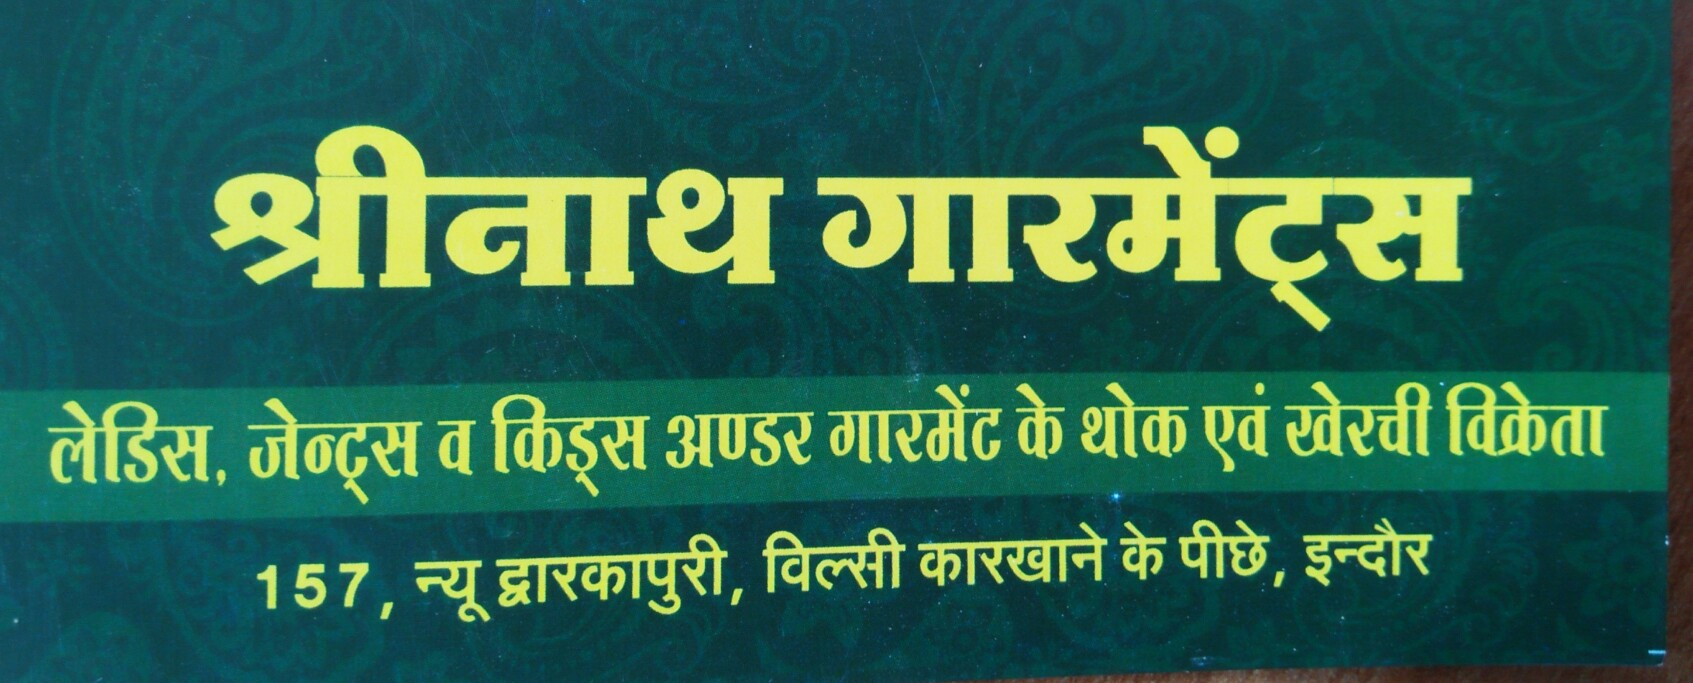 Shri nath garments